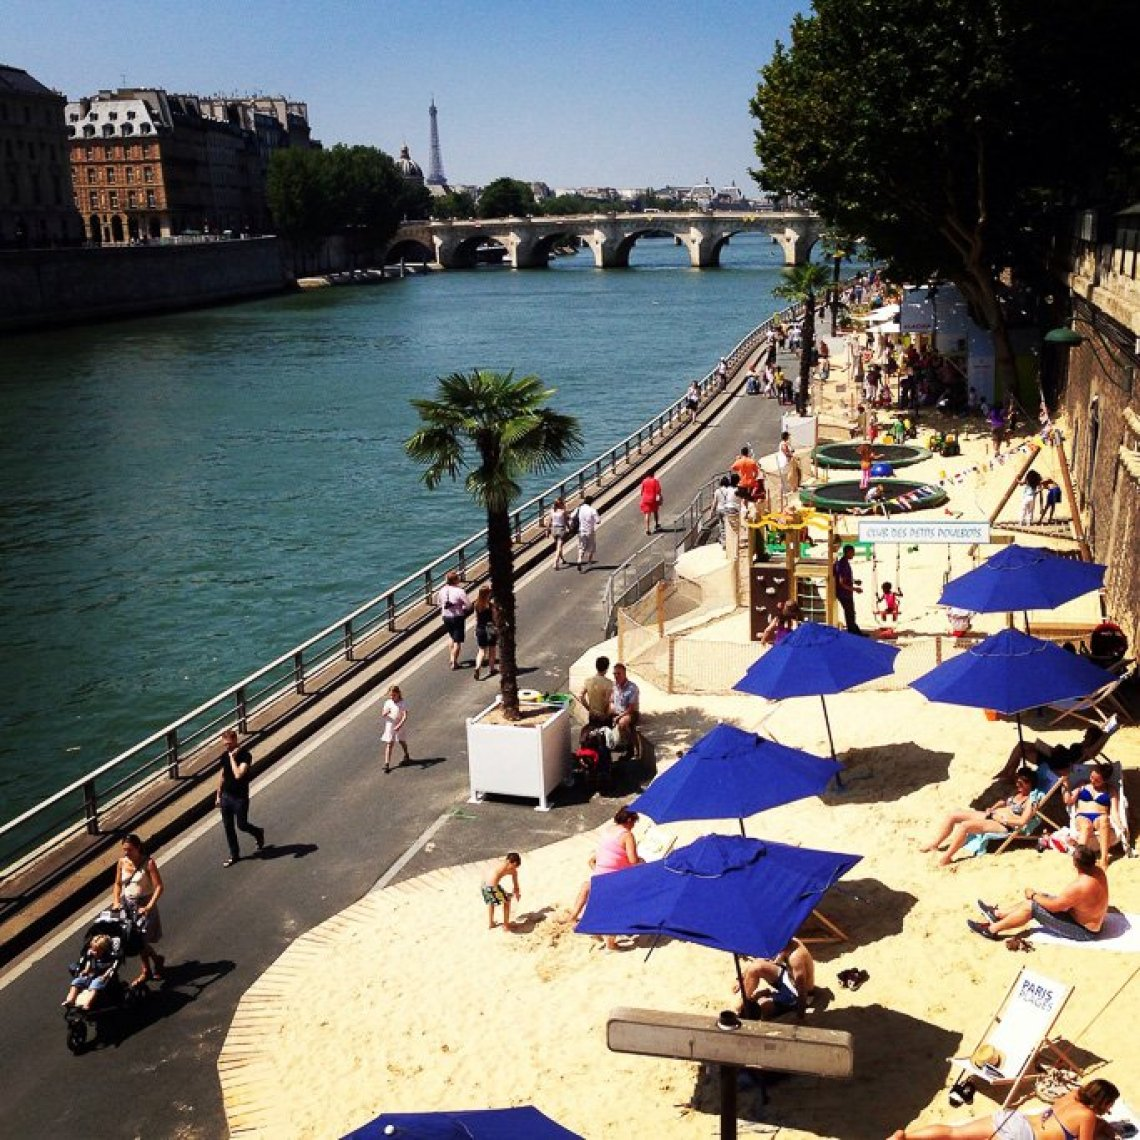 Beach on River Seine, Paris Image Credits: Mark Dyer via Flickr under CC by NC-ND 2.0